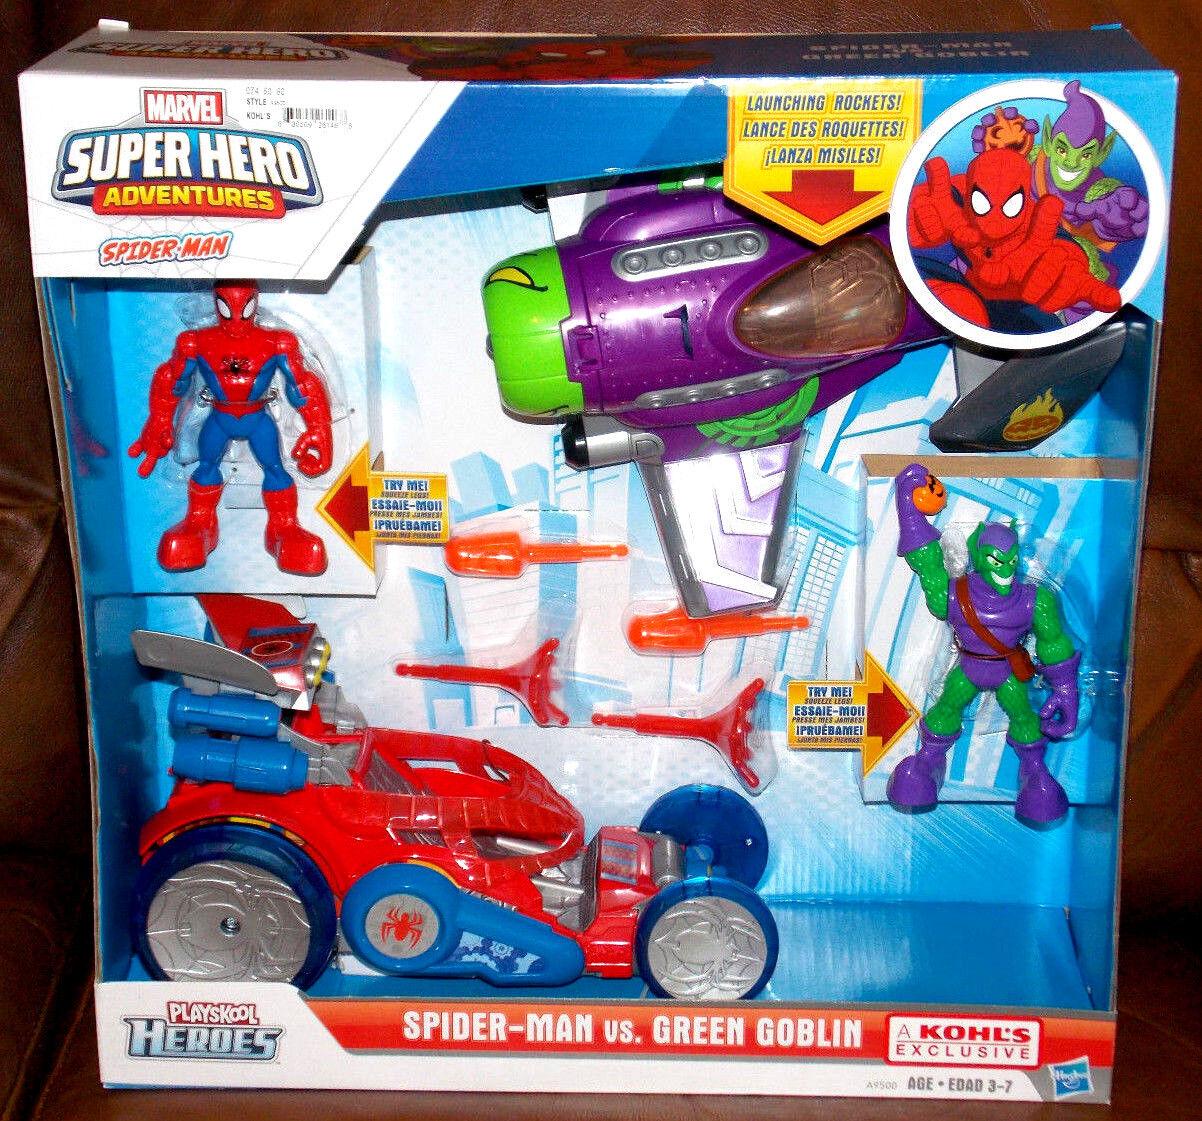 Marvel - superhelden - abenteuer playskool helden spider - man vs. Grün goblin setzen